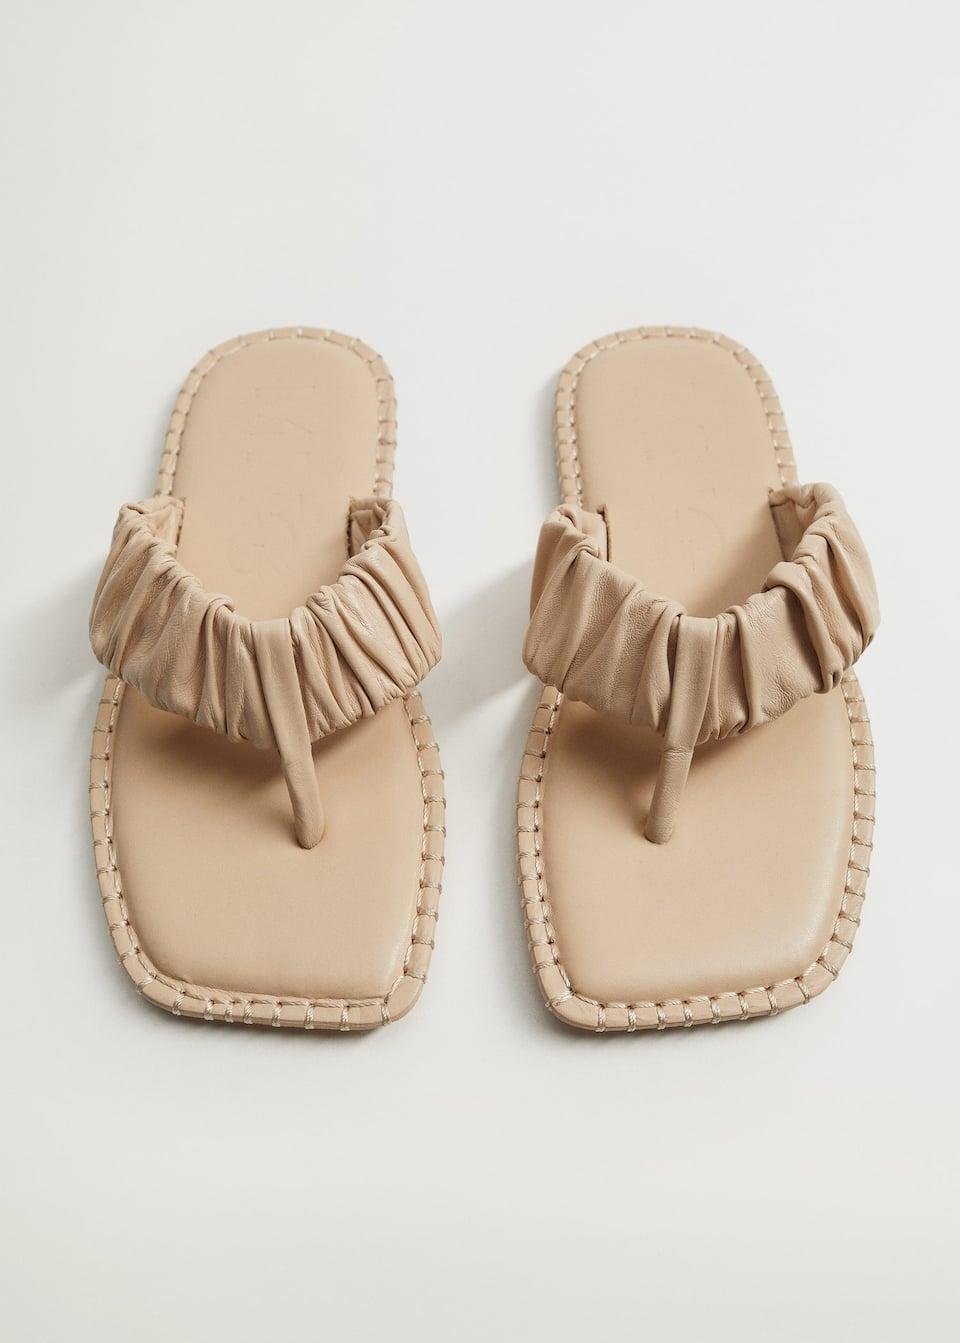 Ruched leather sandals - Medium plane